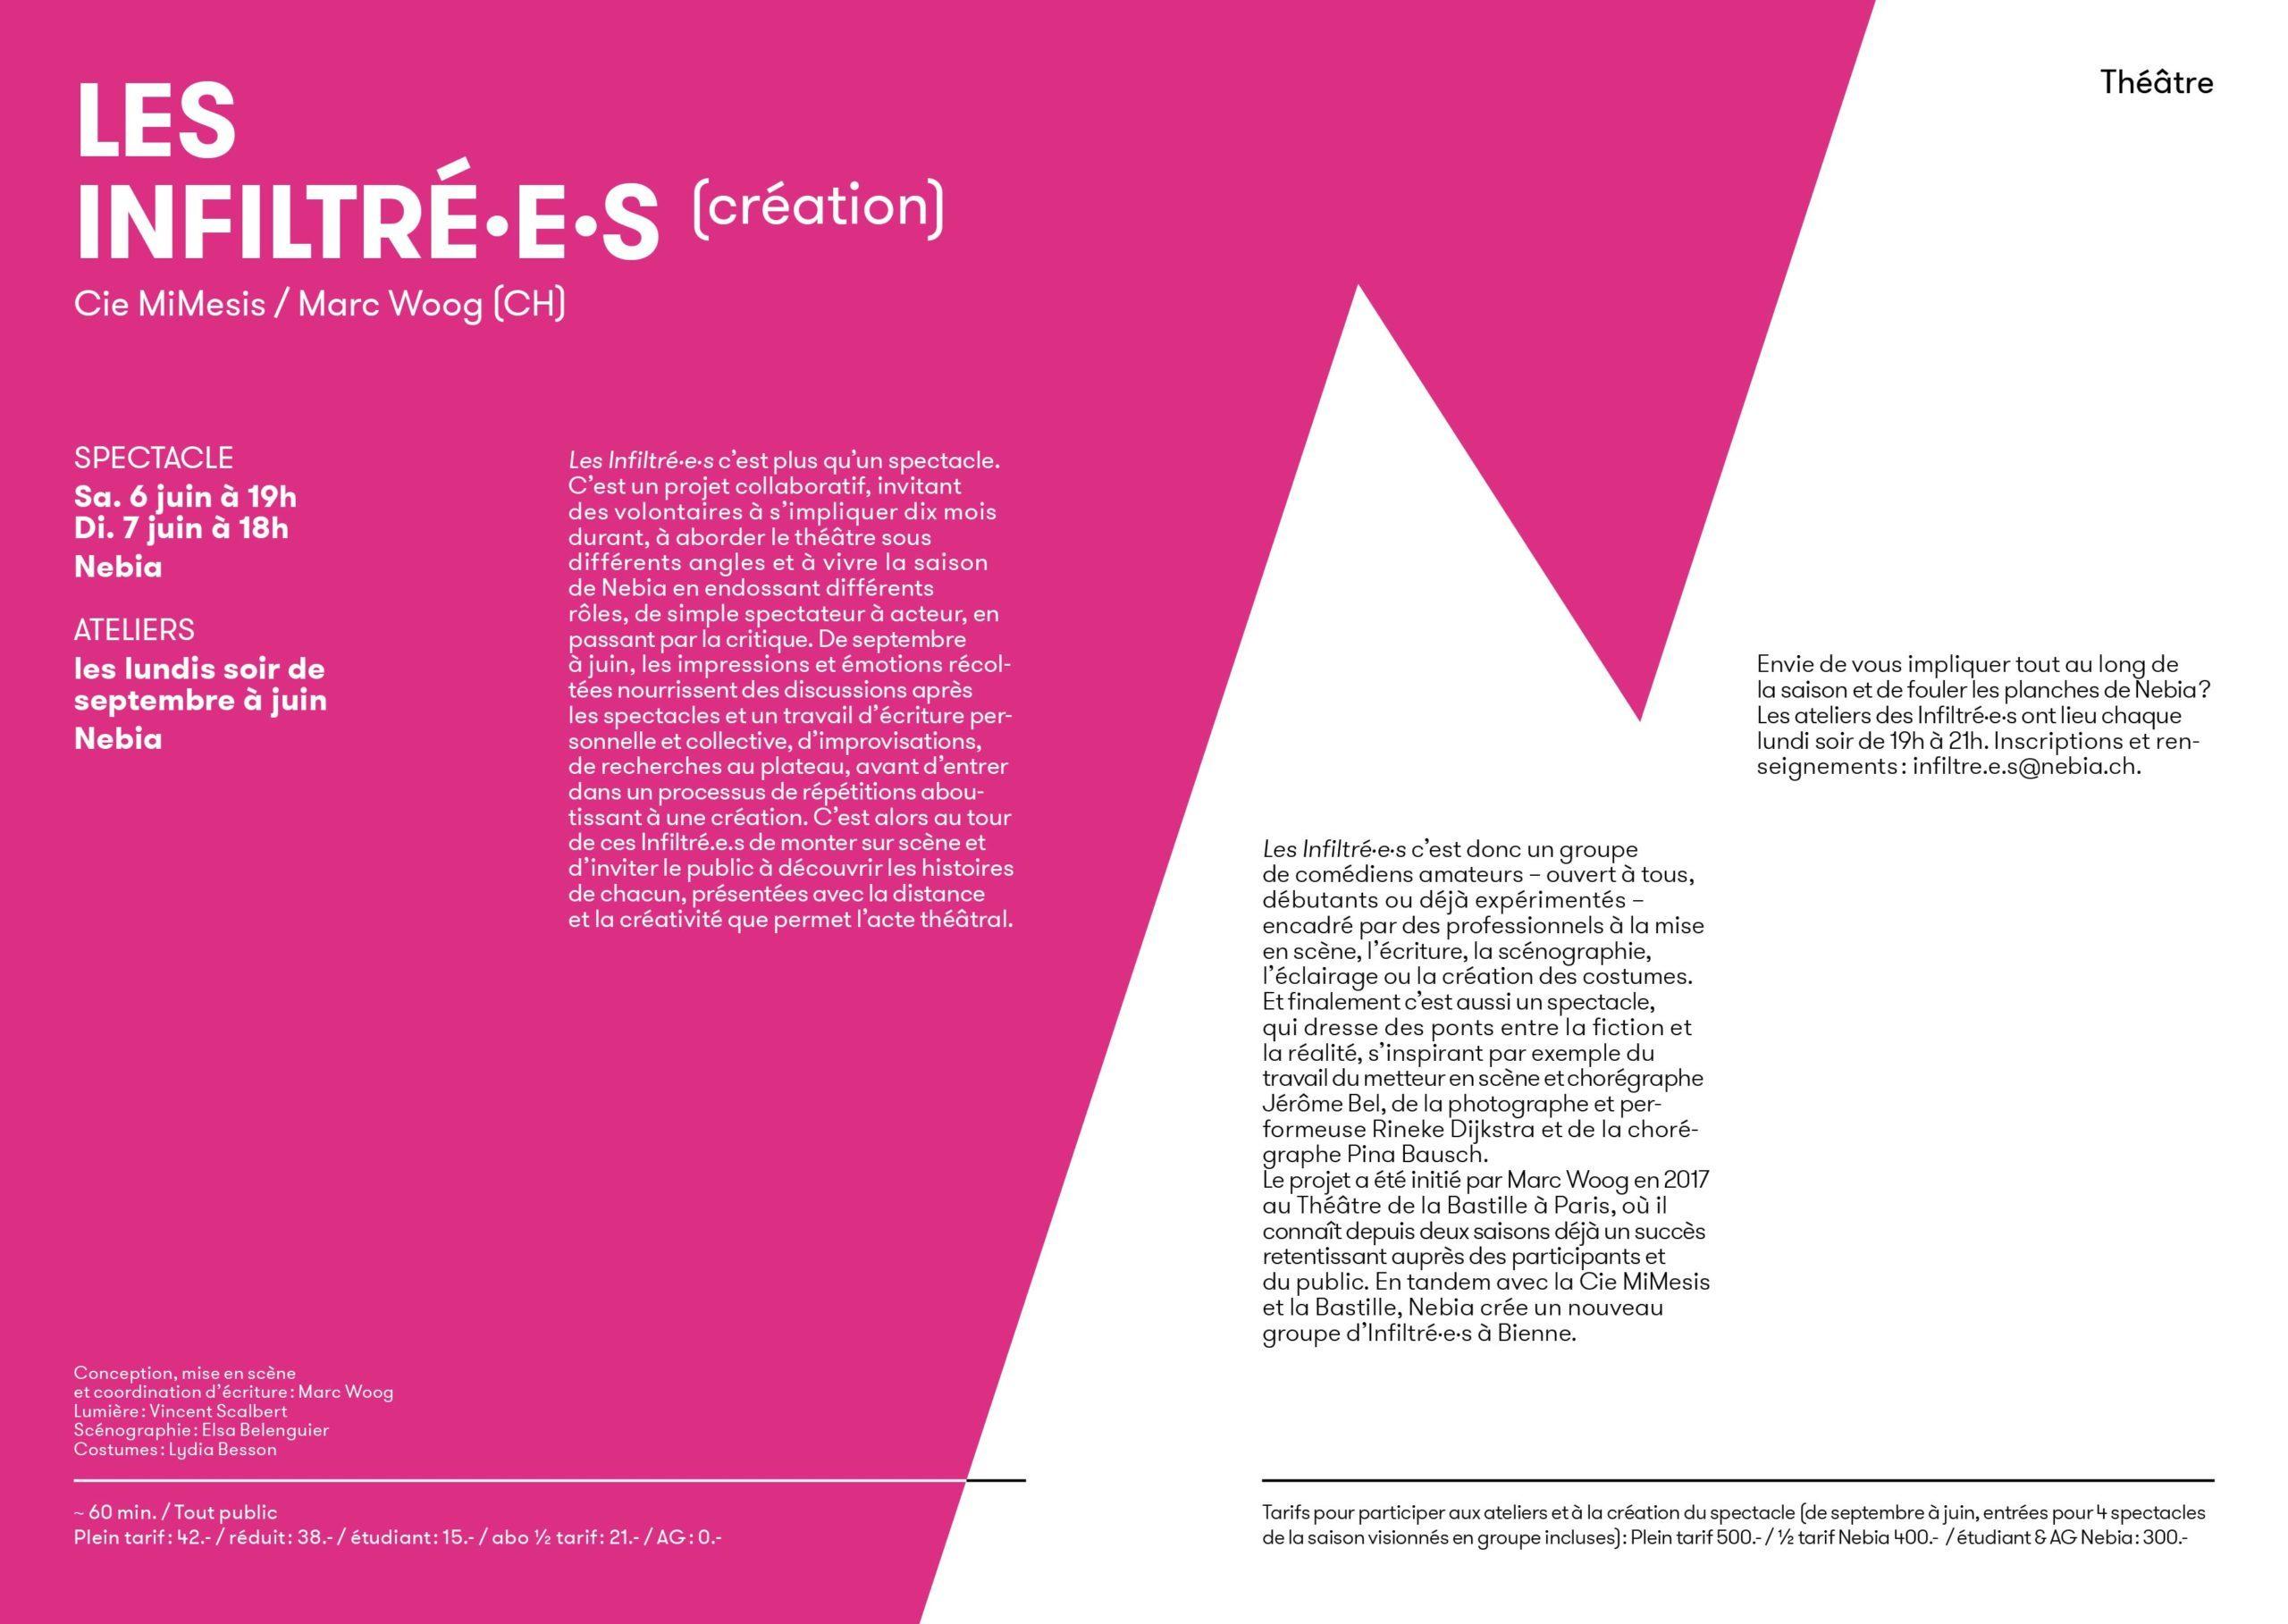 Les-Infiltrees-Cie-Mimesis-Marc-Woog-theatre-atelier-nebia-bienne